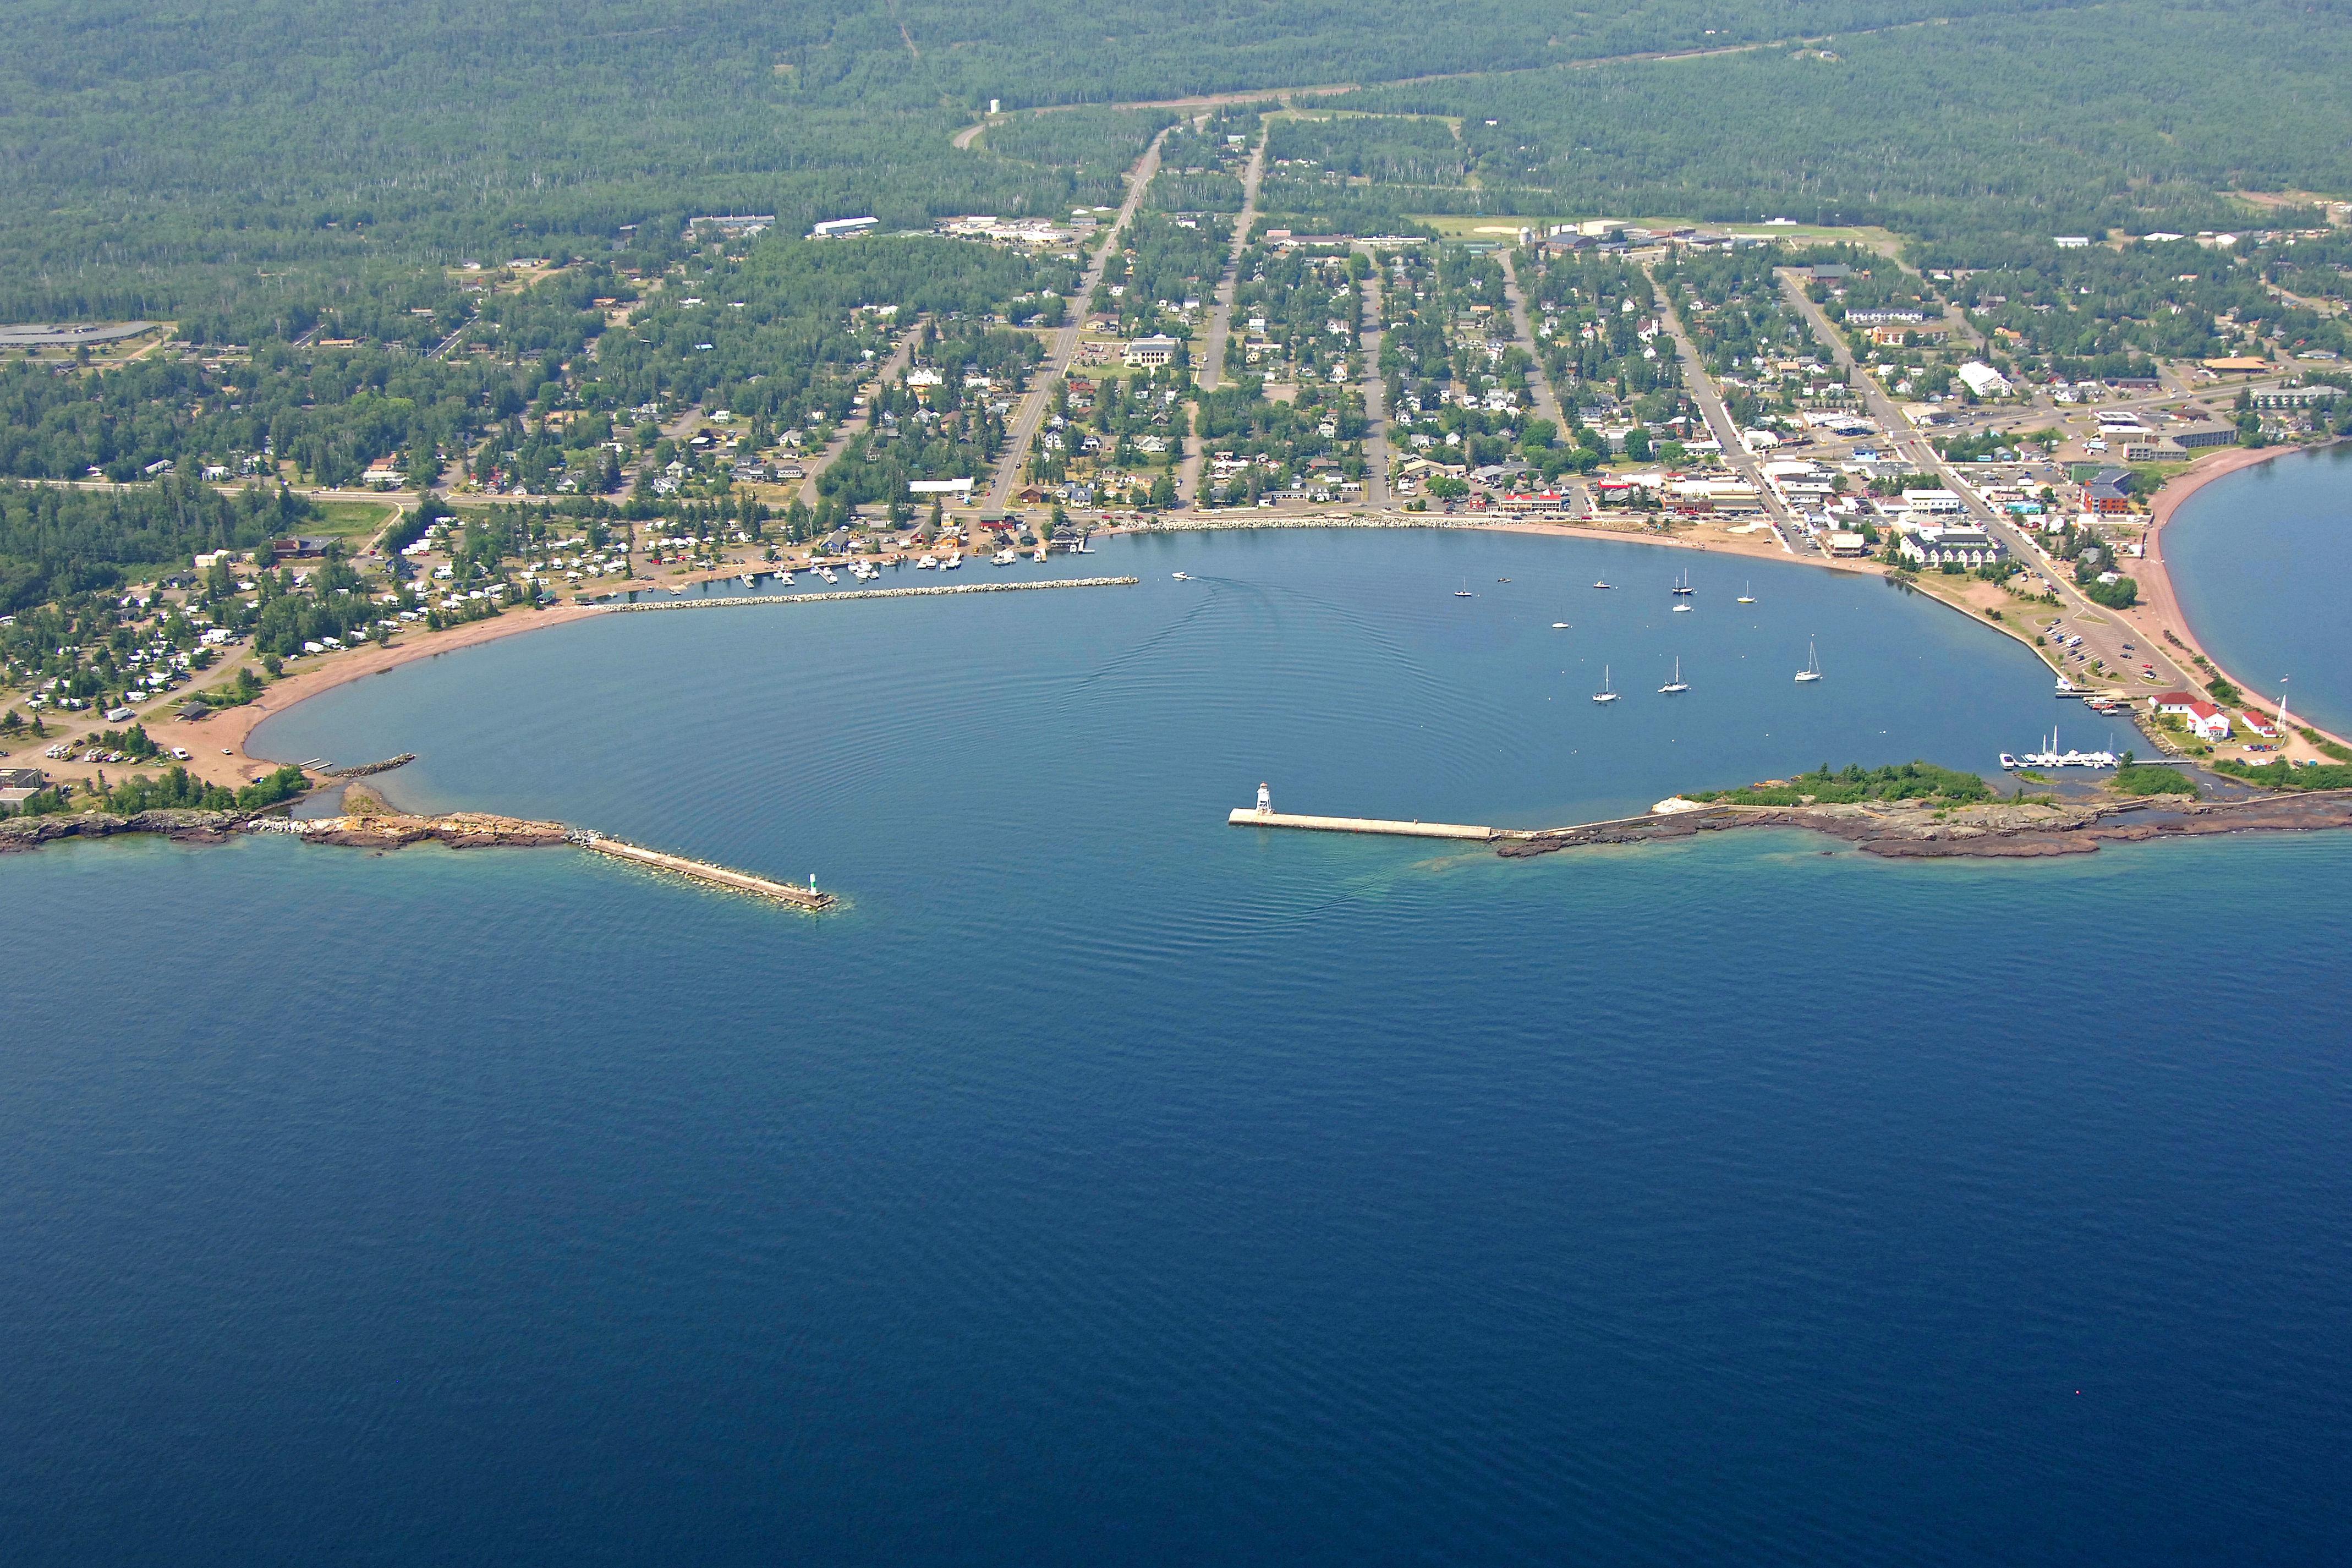 Grand Marais Harbor in Grand Marais, MN, United States